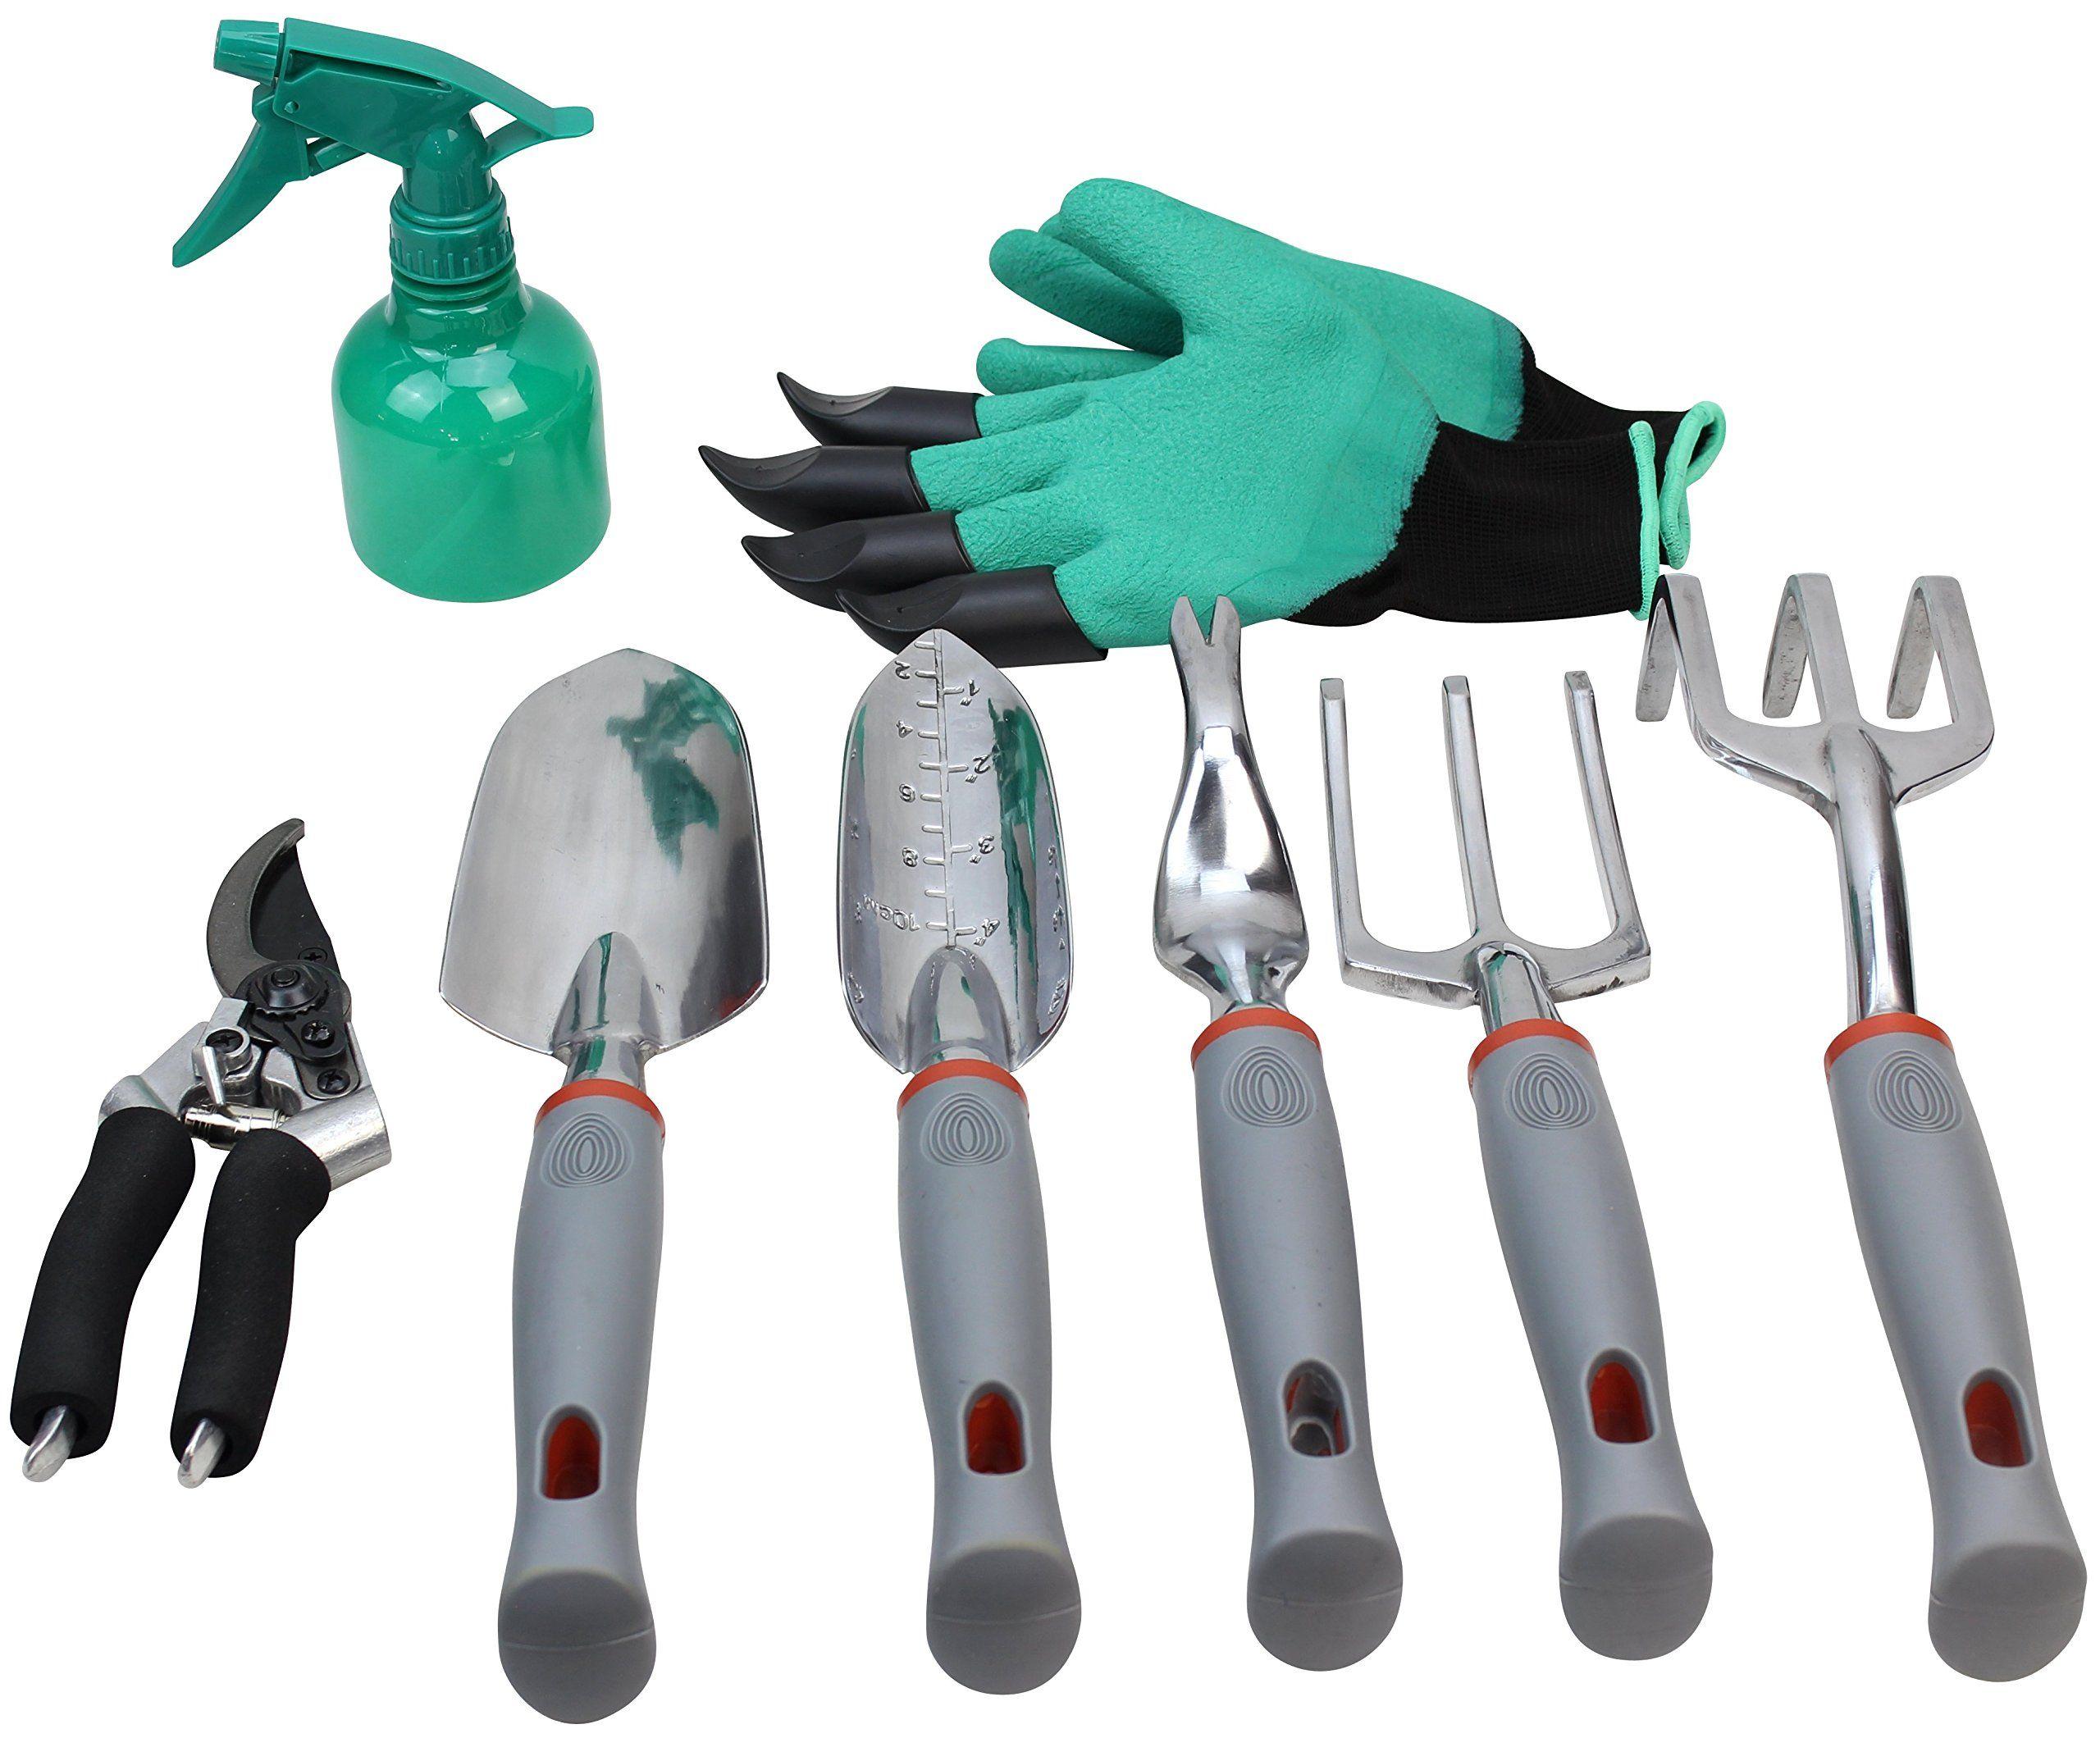 Gardening Tools Set Garden Tools Kit Gardening Gloves 9 Piece